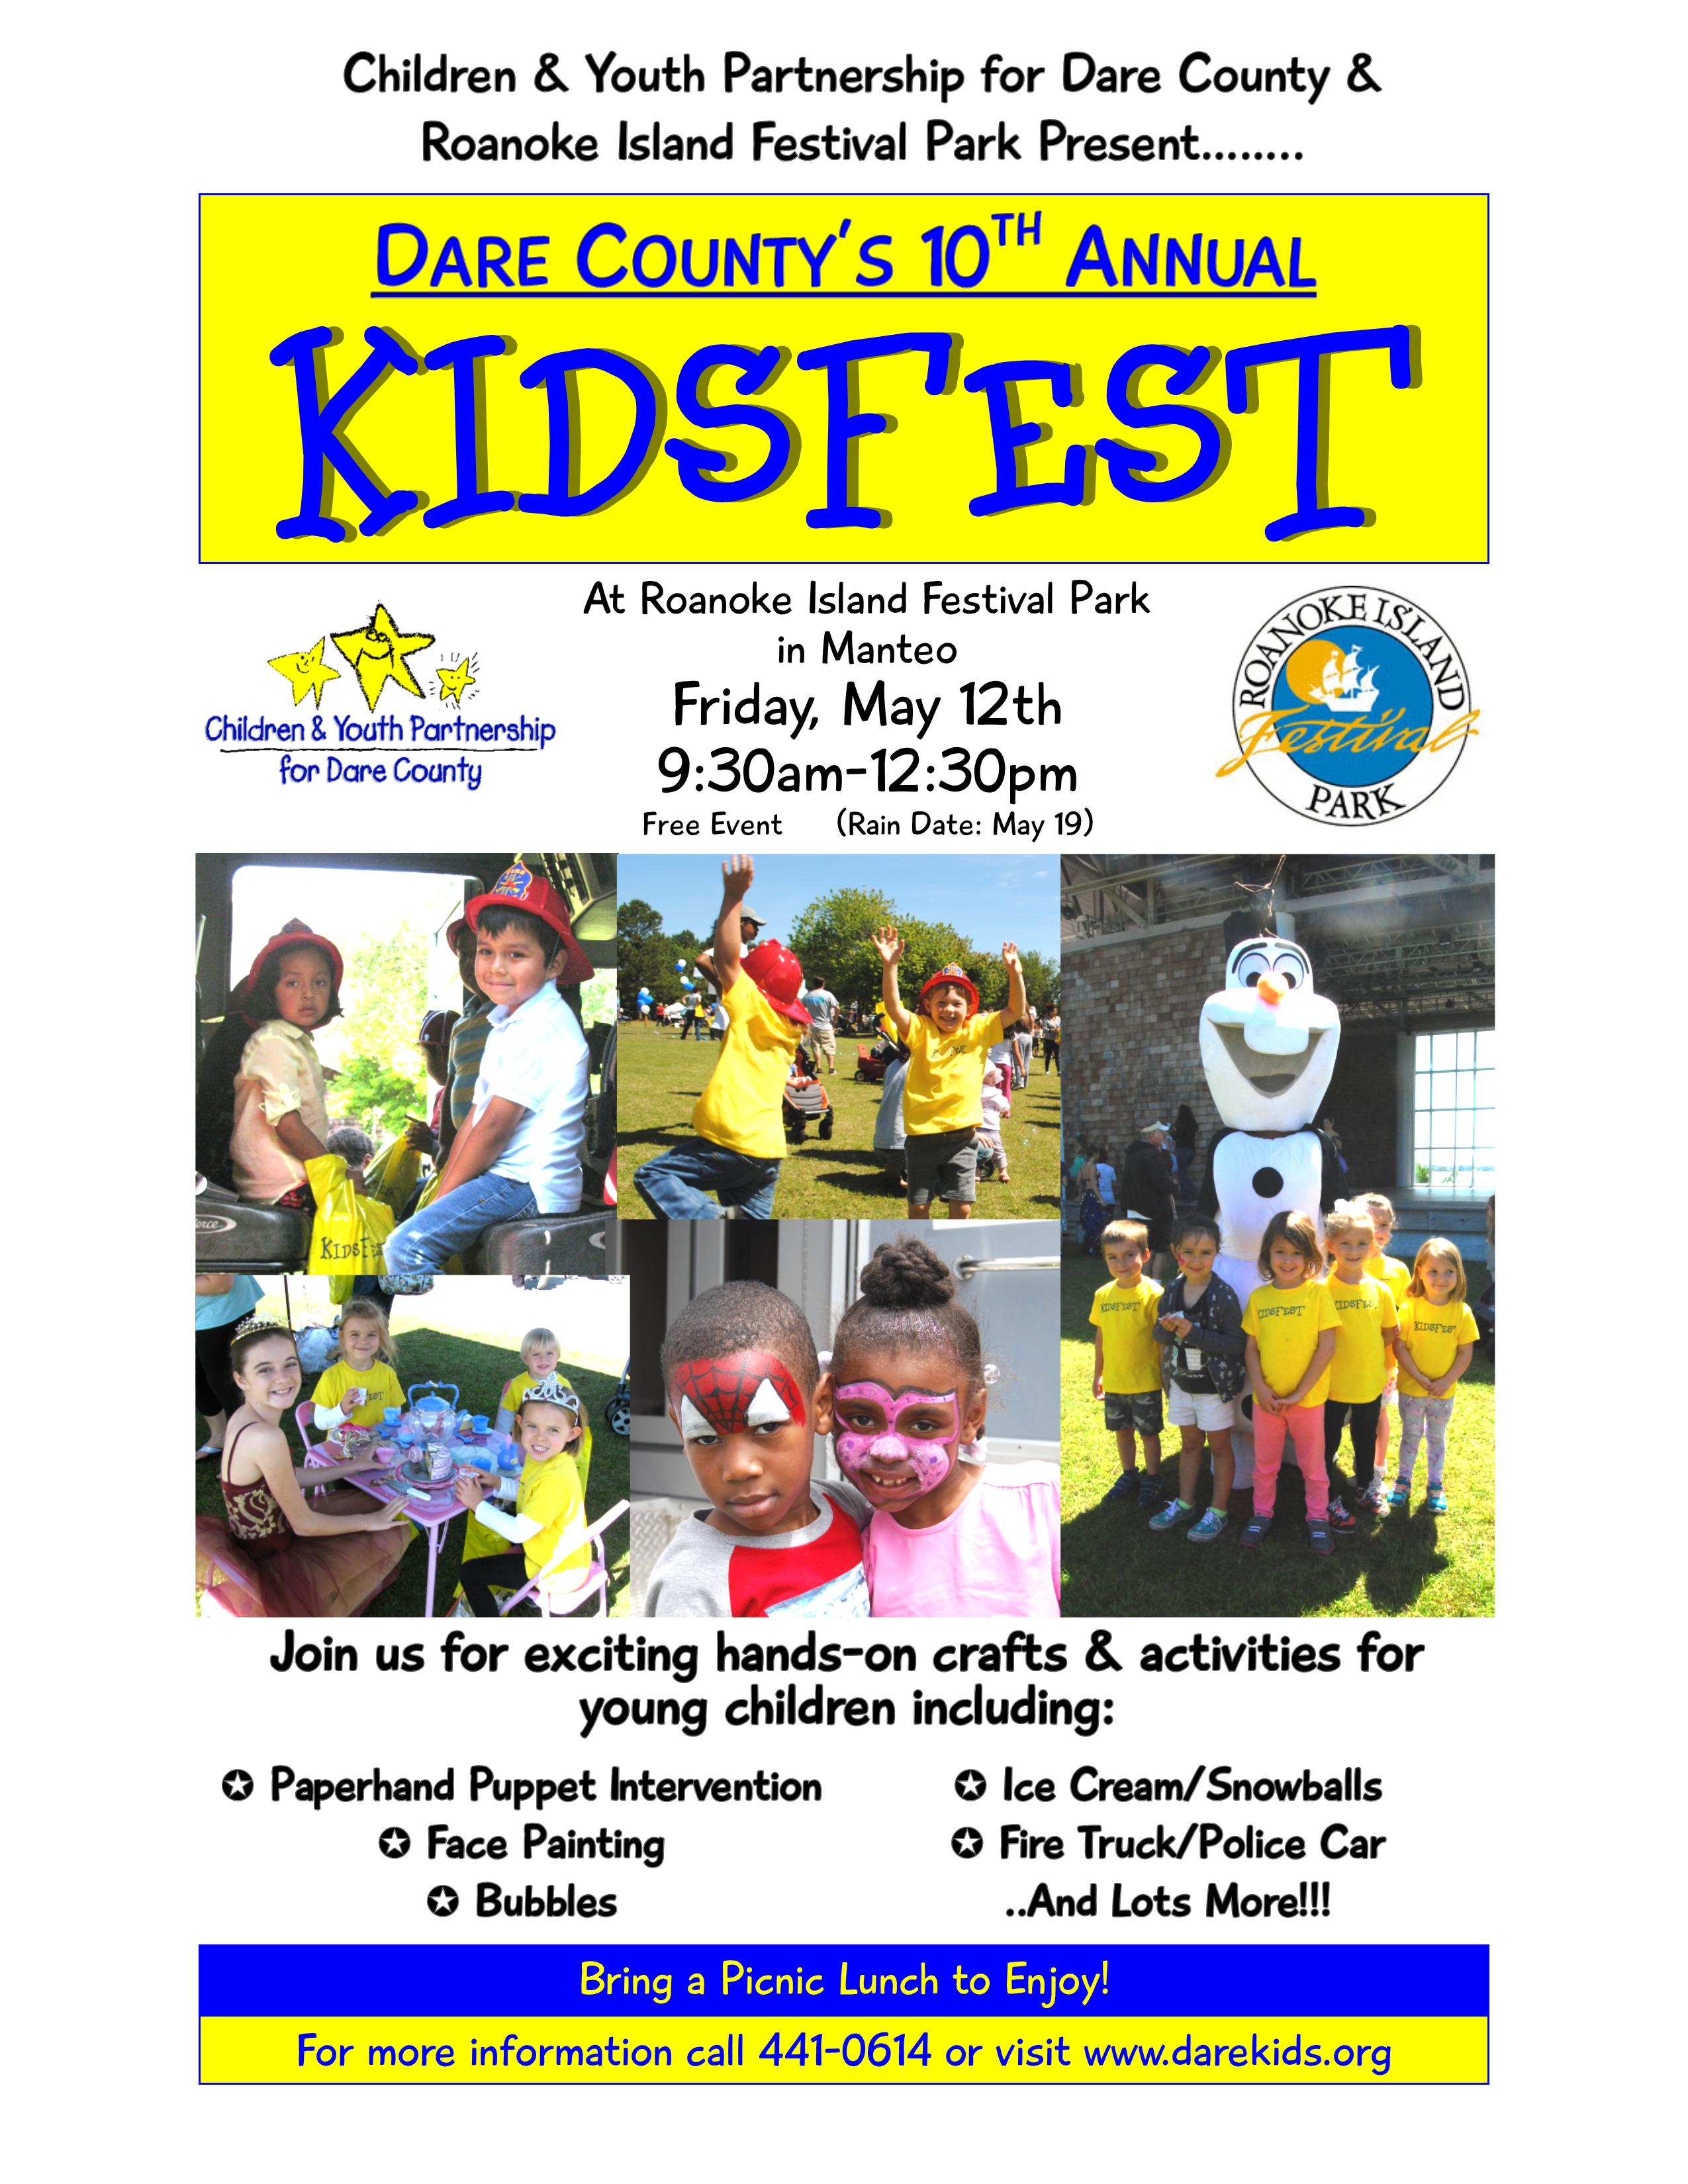 Annual Kidsfest